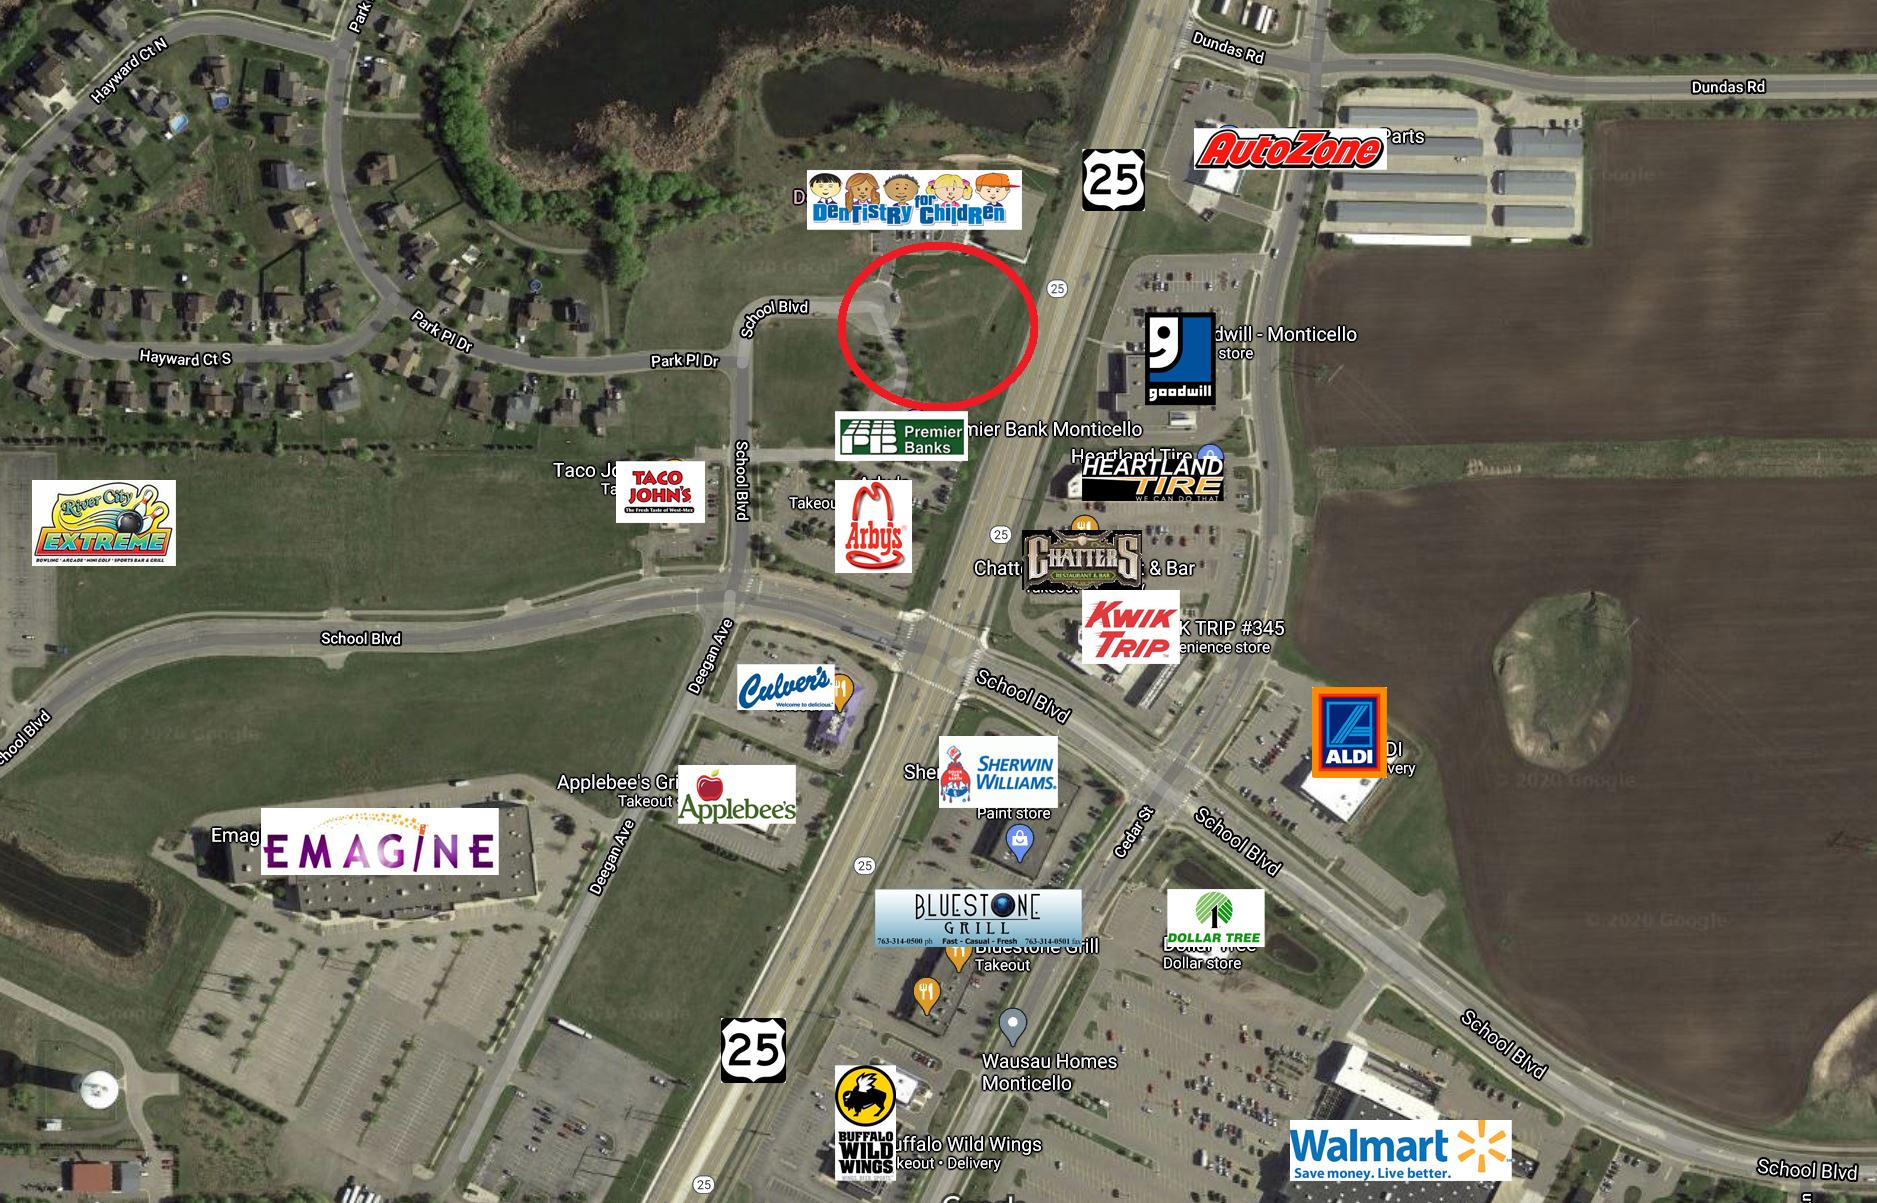 Monticello – Deegan Avenue 1.16 Acre Commercial Land